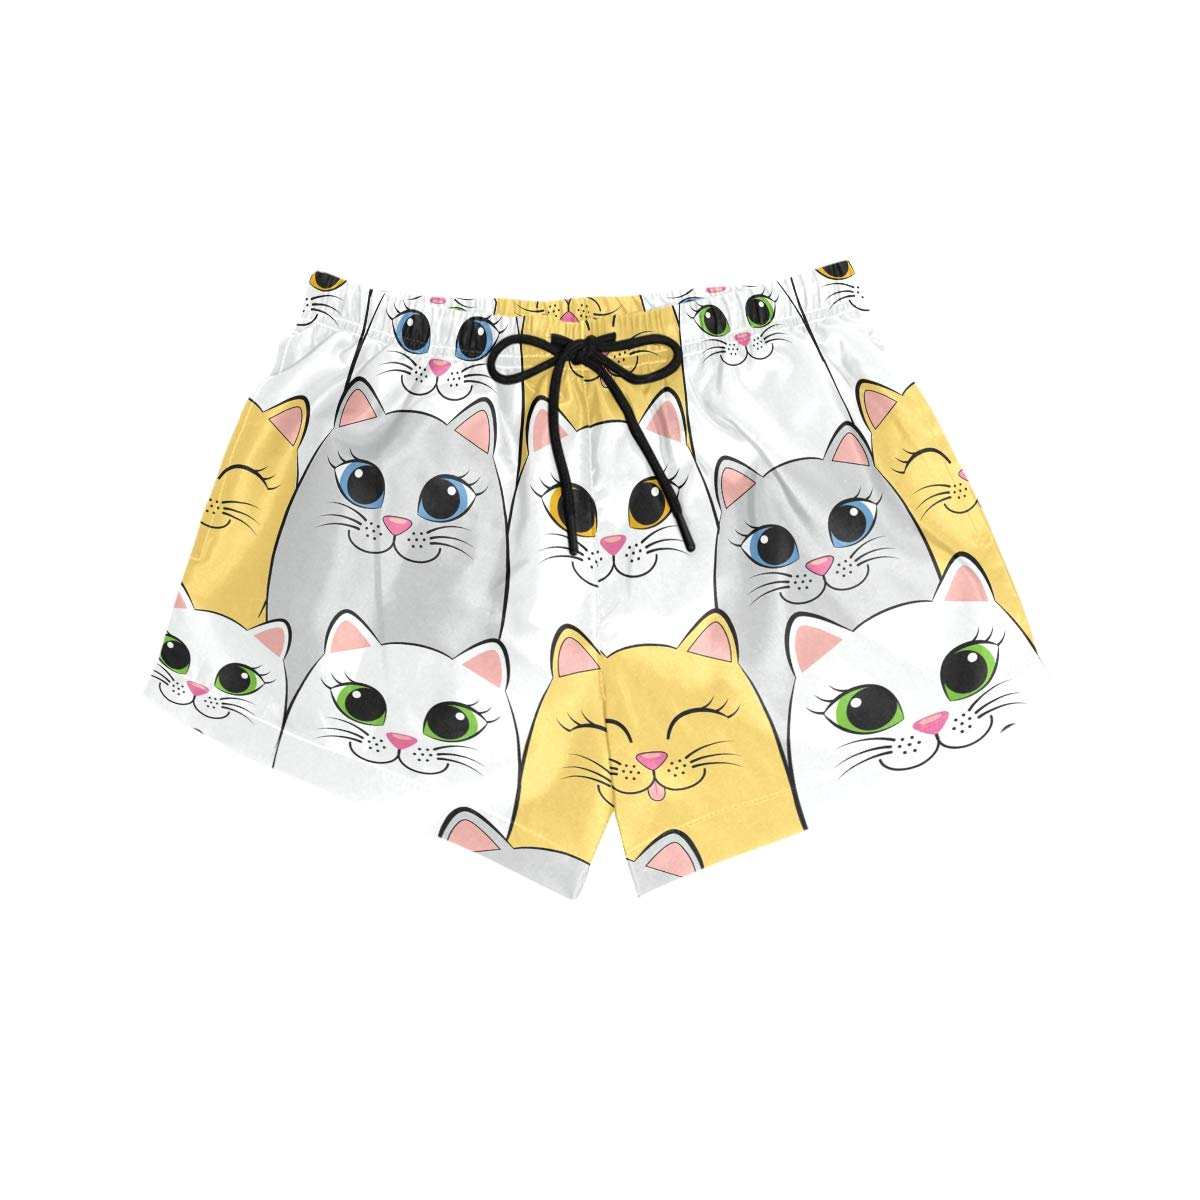 Women Swim Trunks Grey Yellow White Cats Smiling Beach Board Shorts